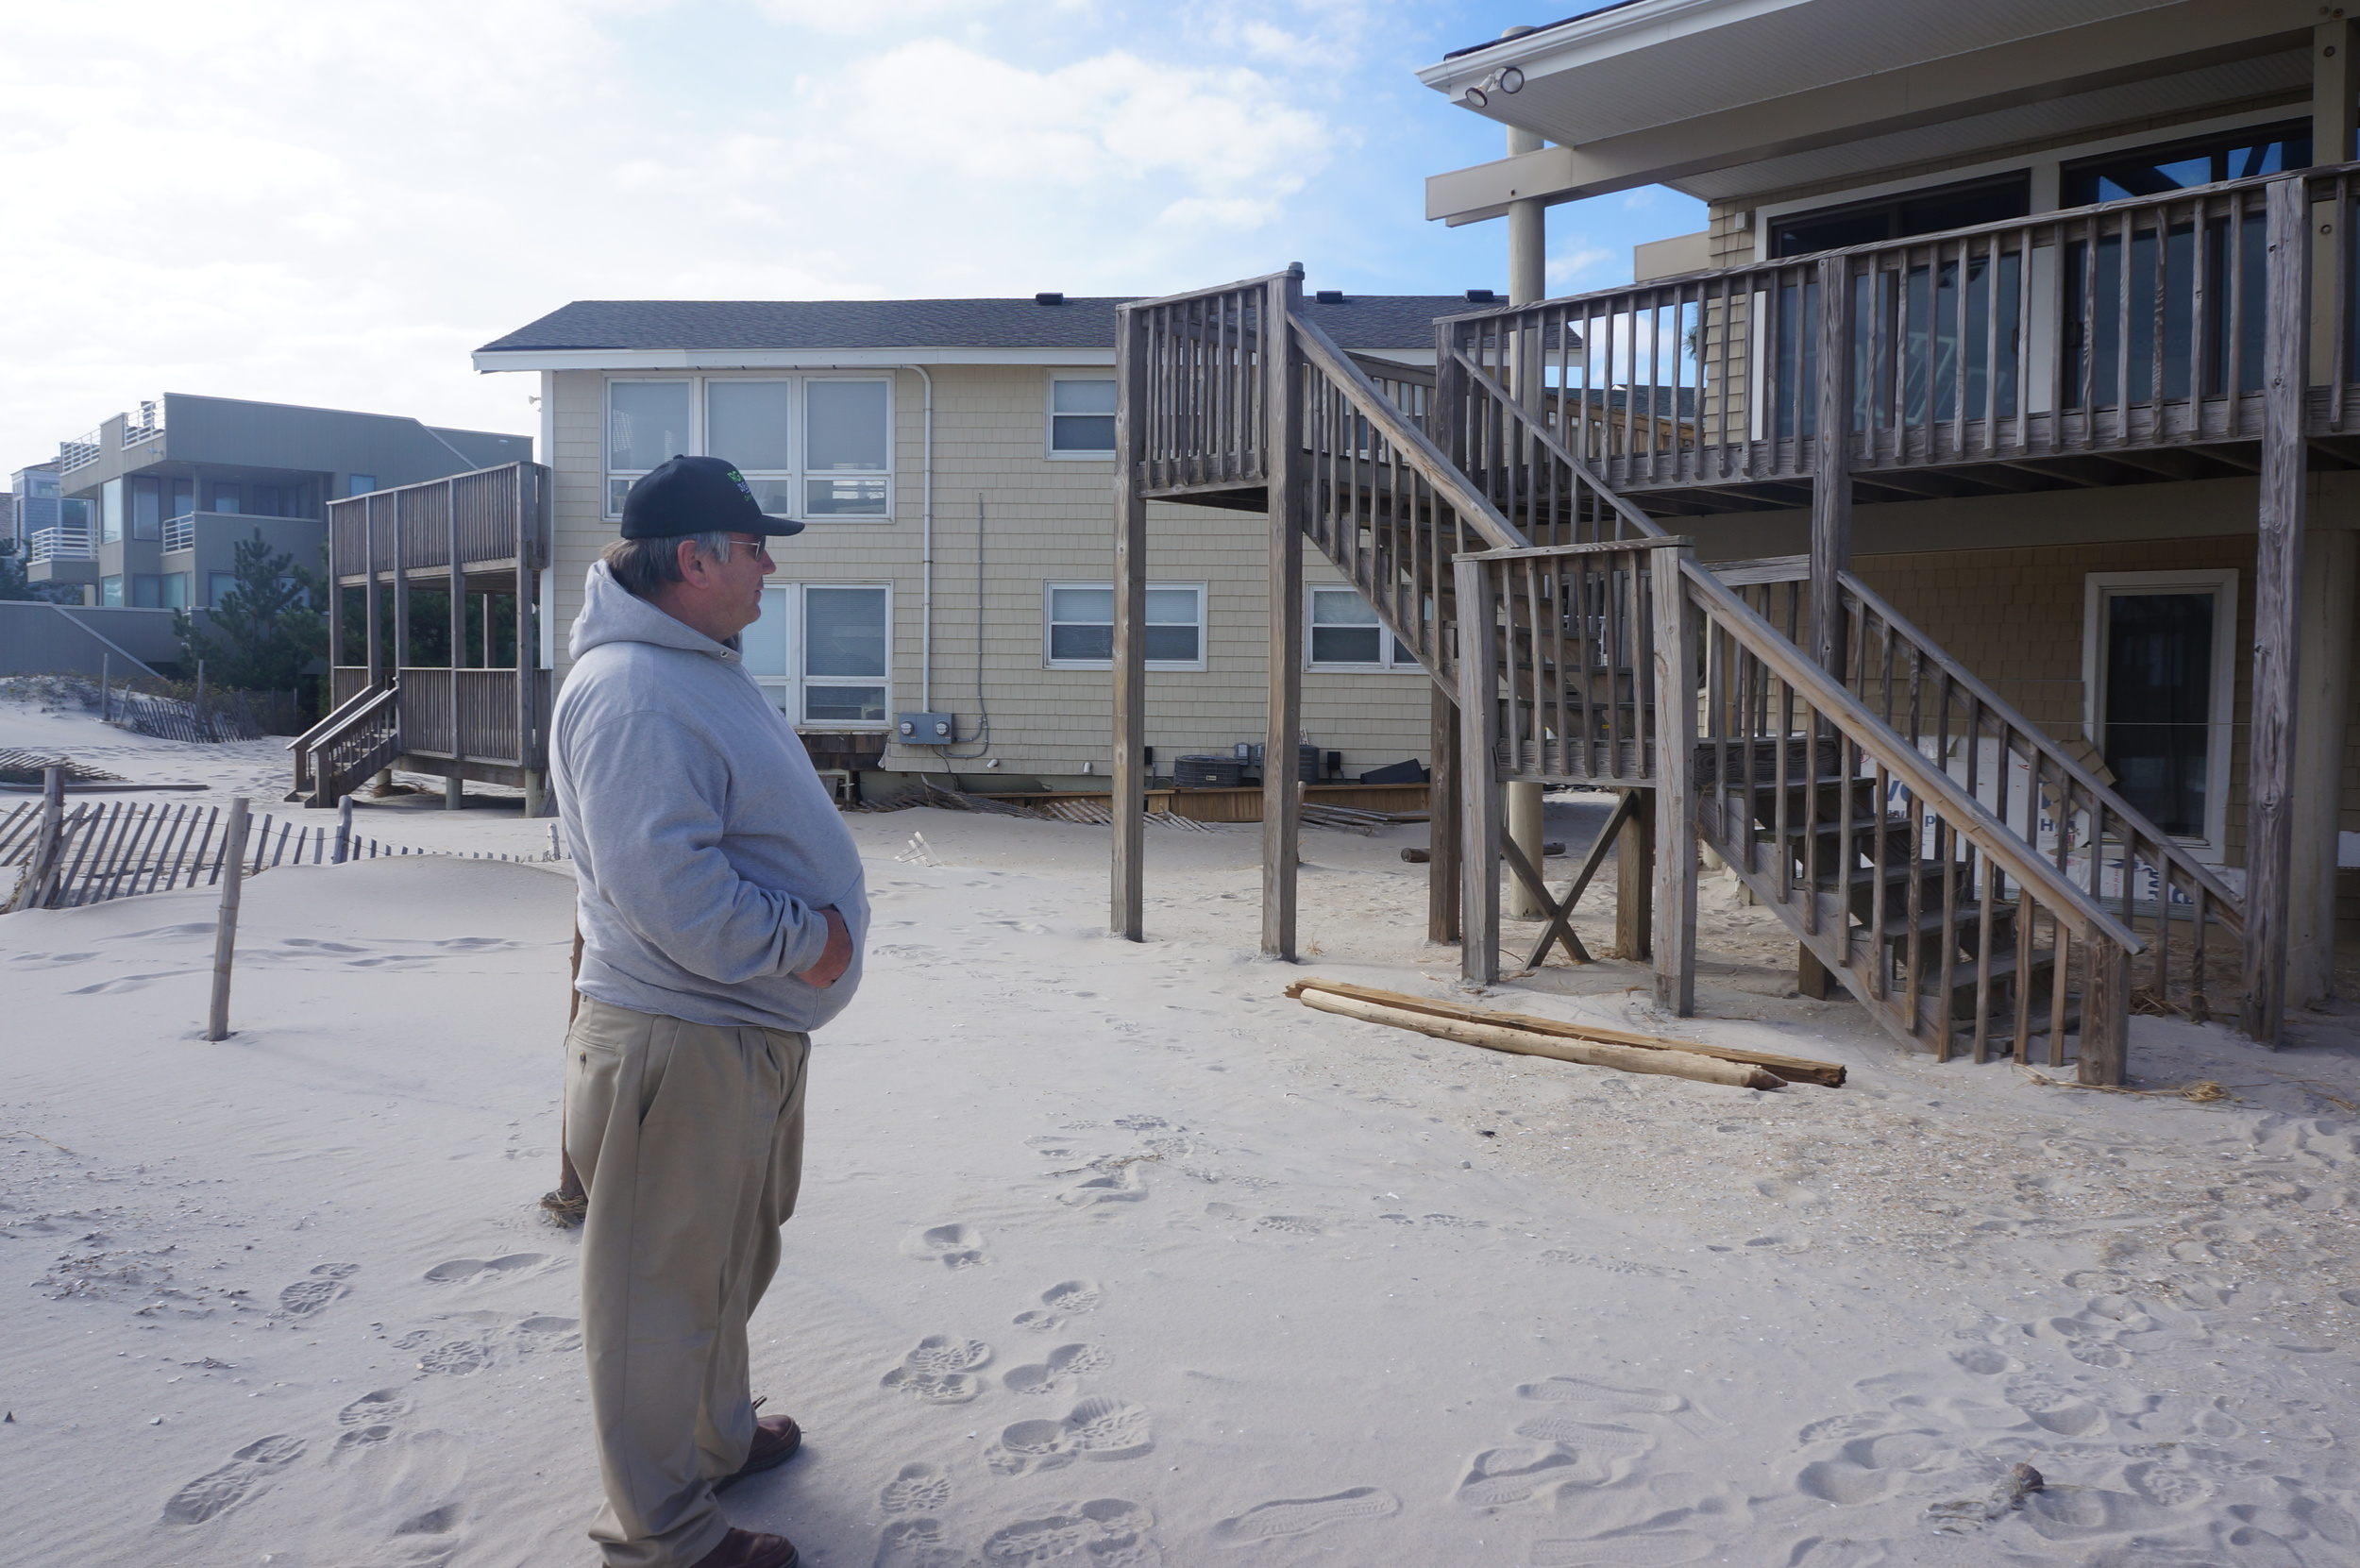 Bob Hume, David Hume, and RGH Development Company assessing storm damage in Long Beach Island (LBI).